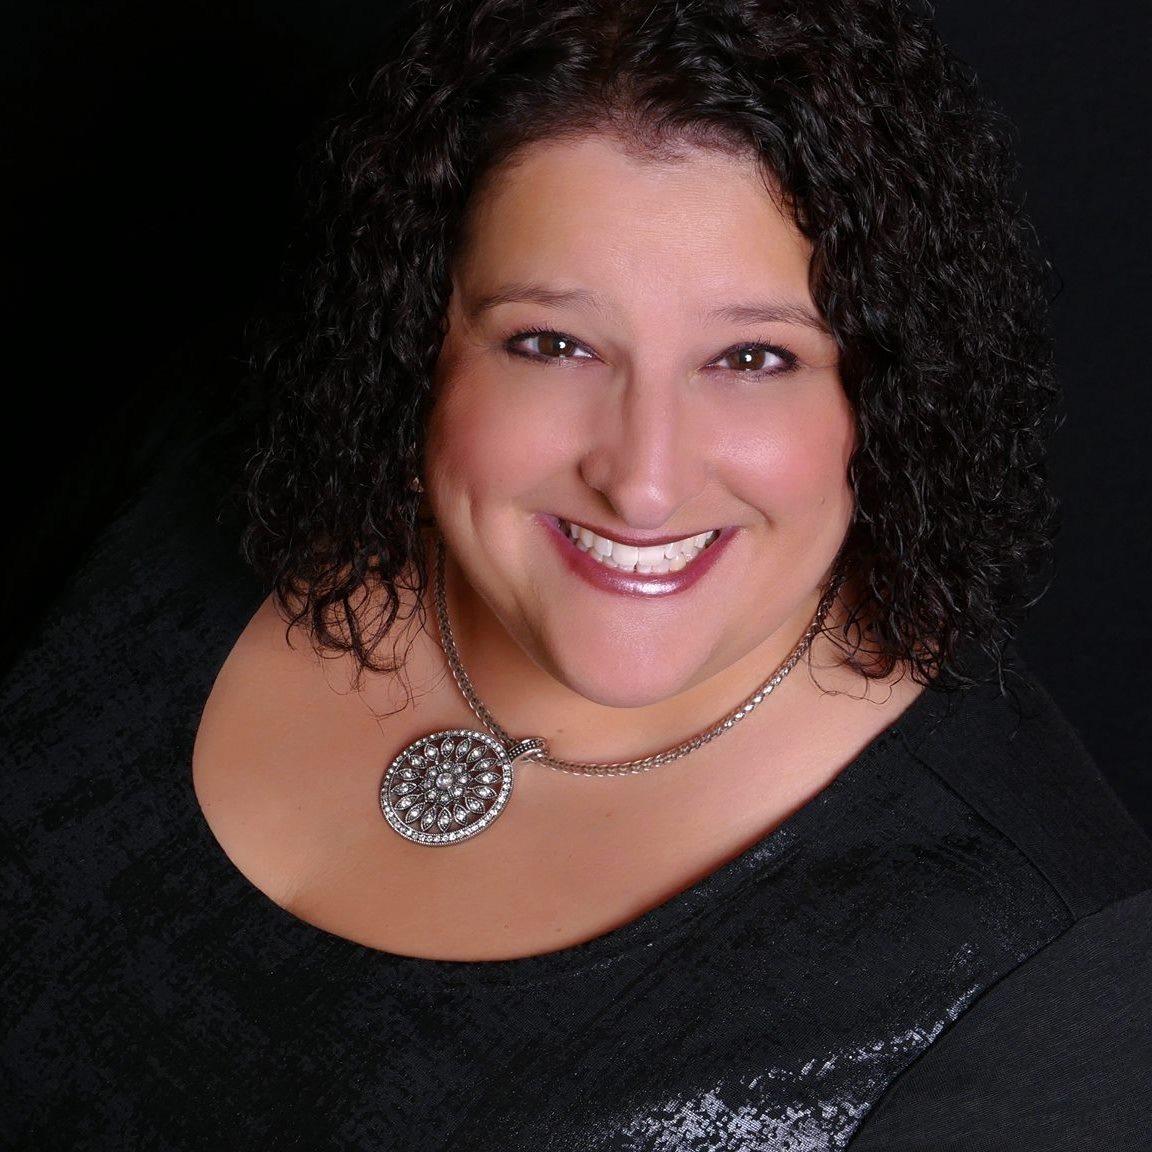 Wendy Lynn Sarasota Realtor with Fine Properties